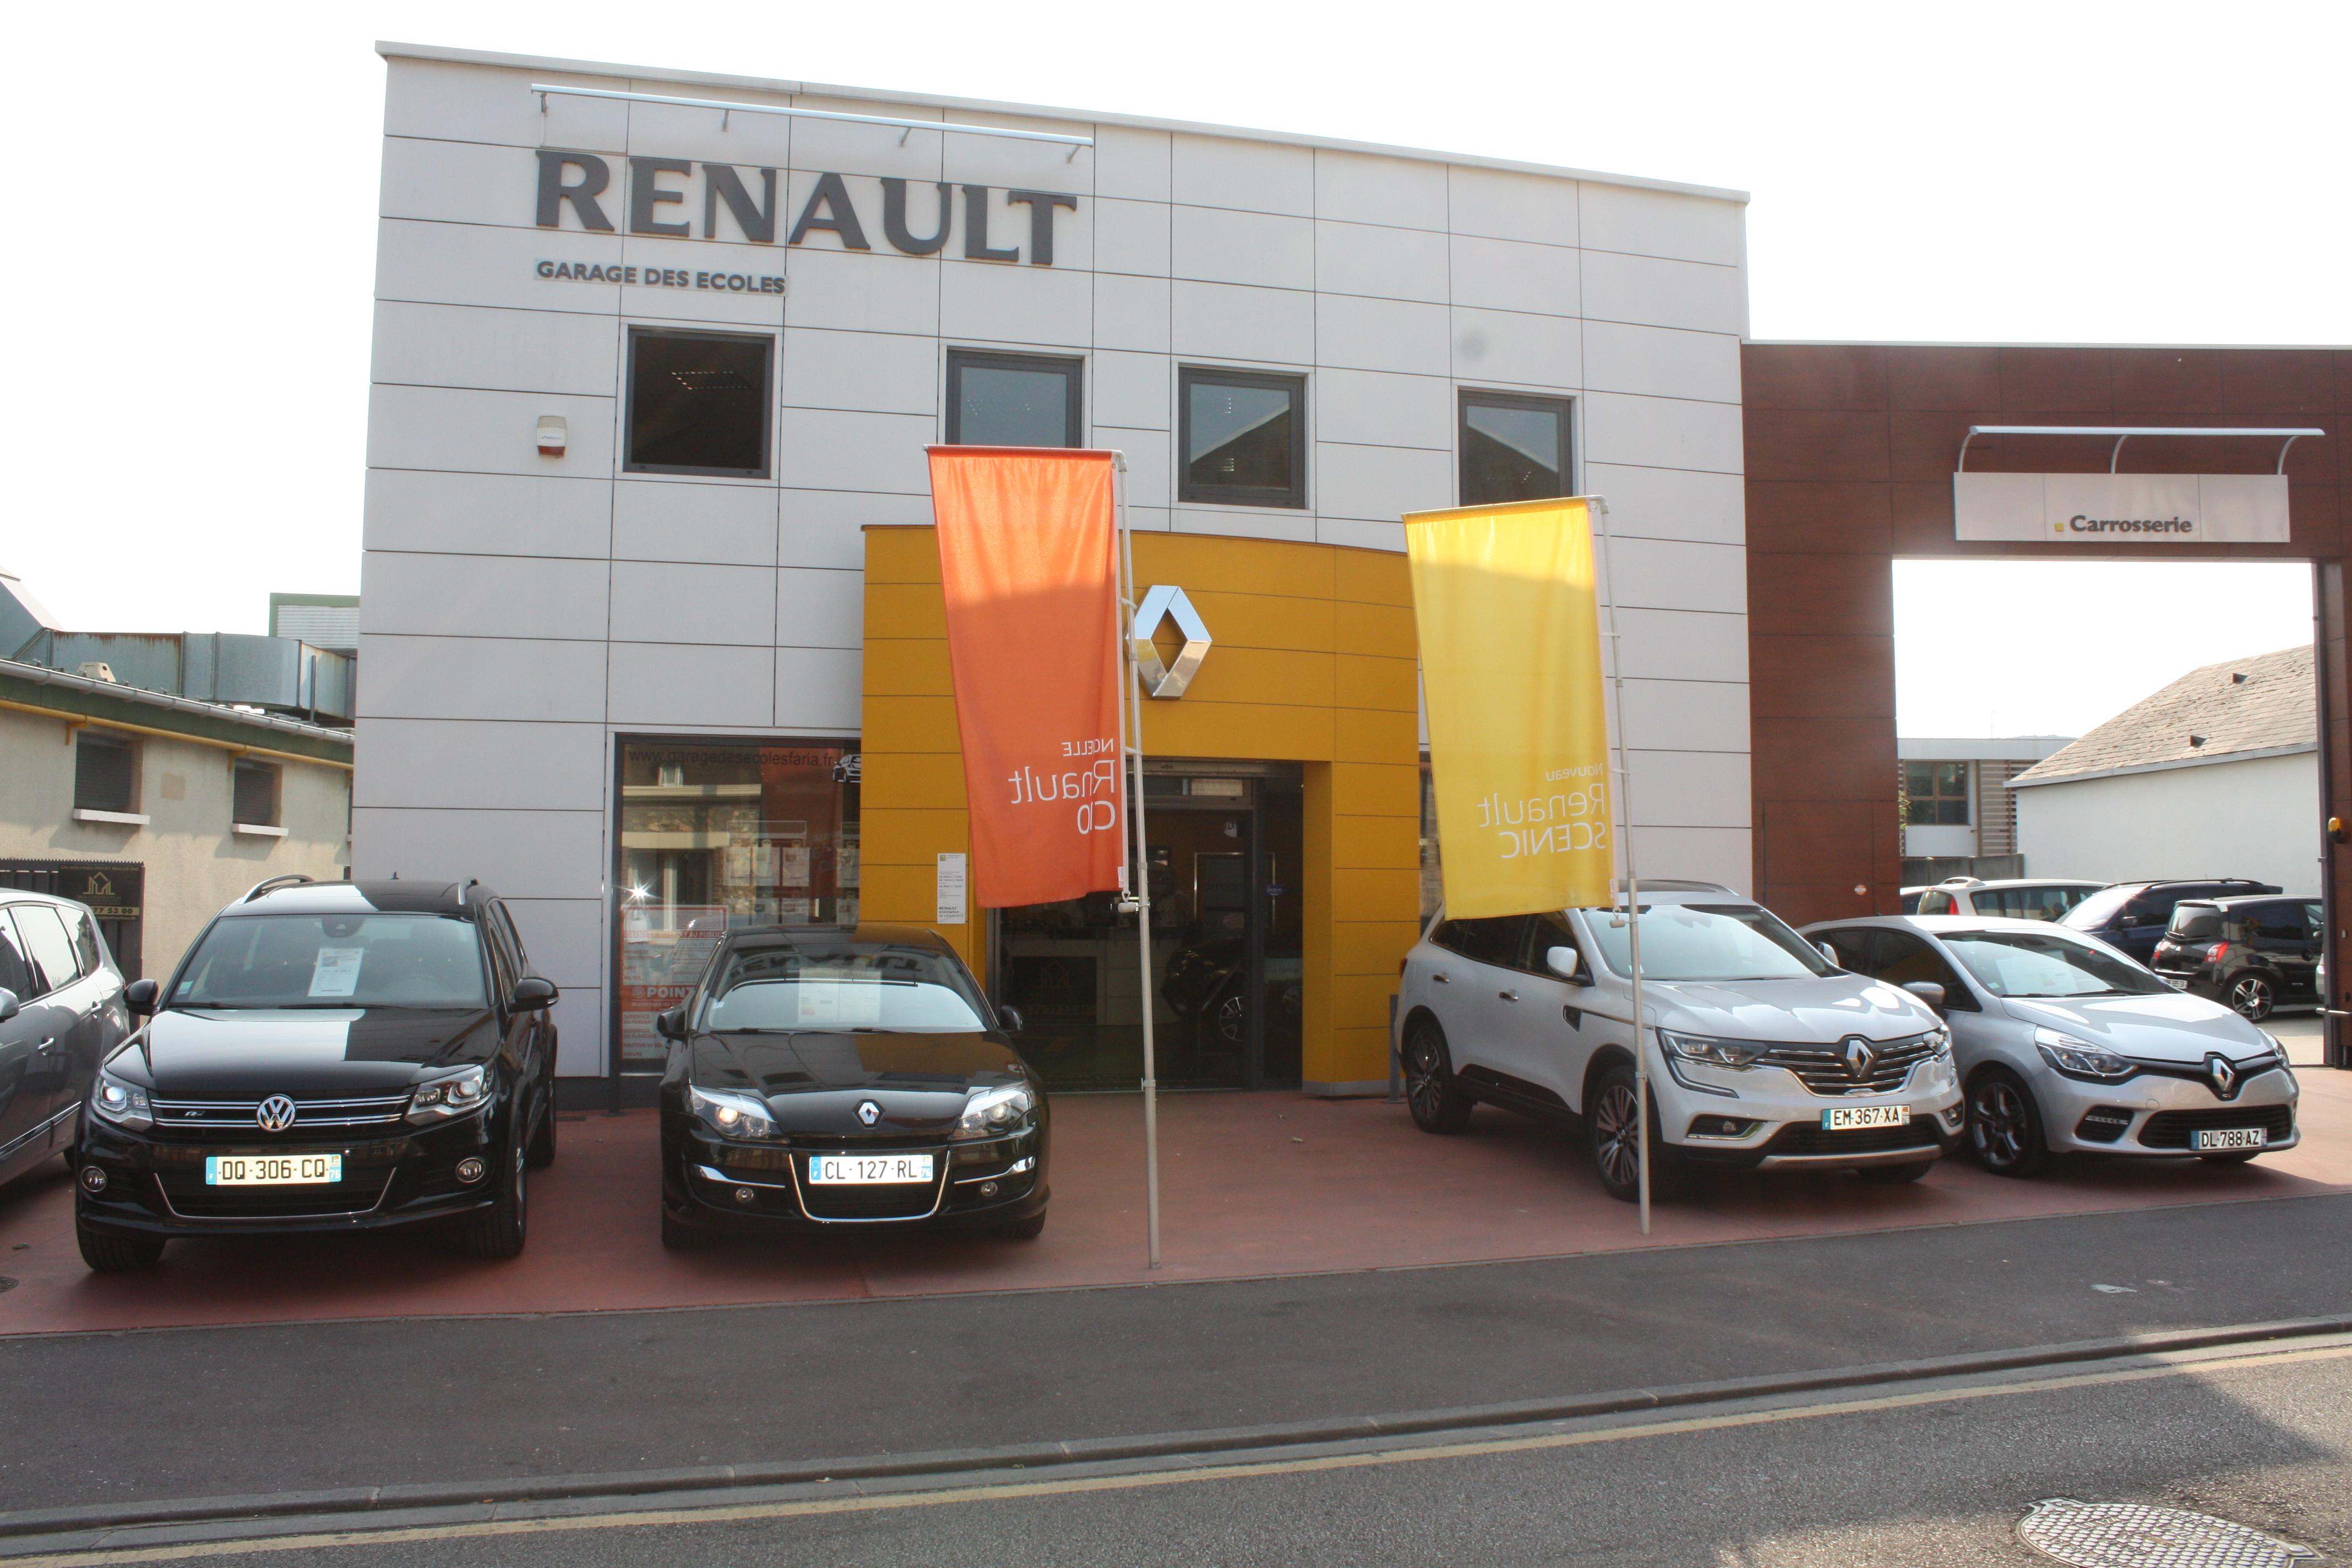 Garage des ecoles voiture occasion st etienne du rouvray vente auto st etienne du rouvray - Garage citroen st etienne ...